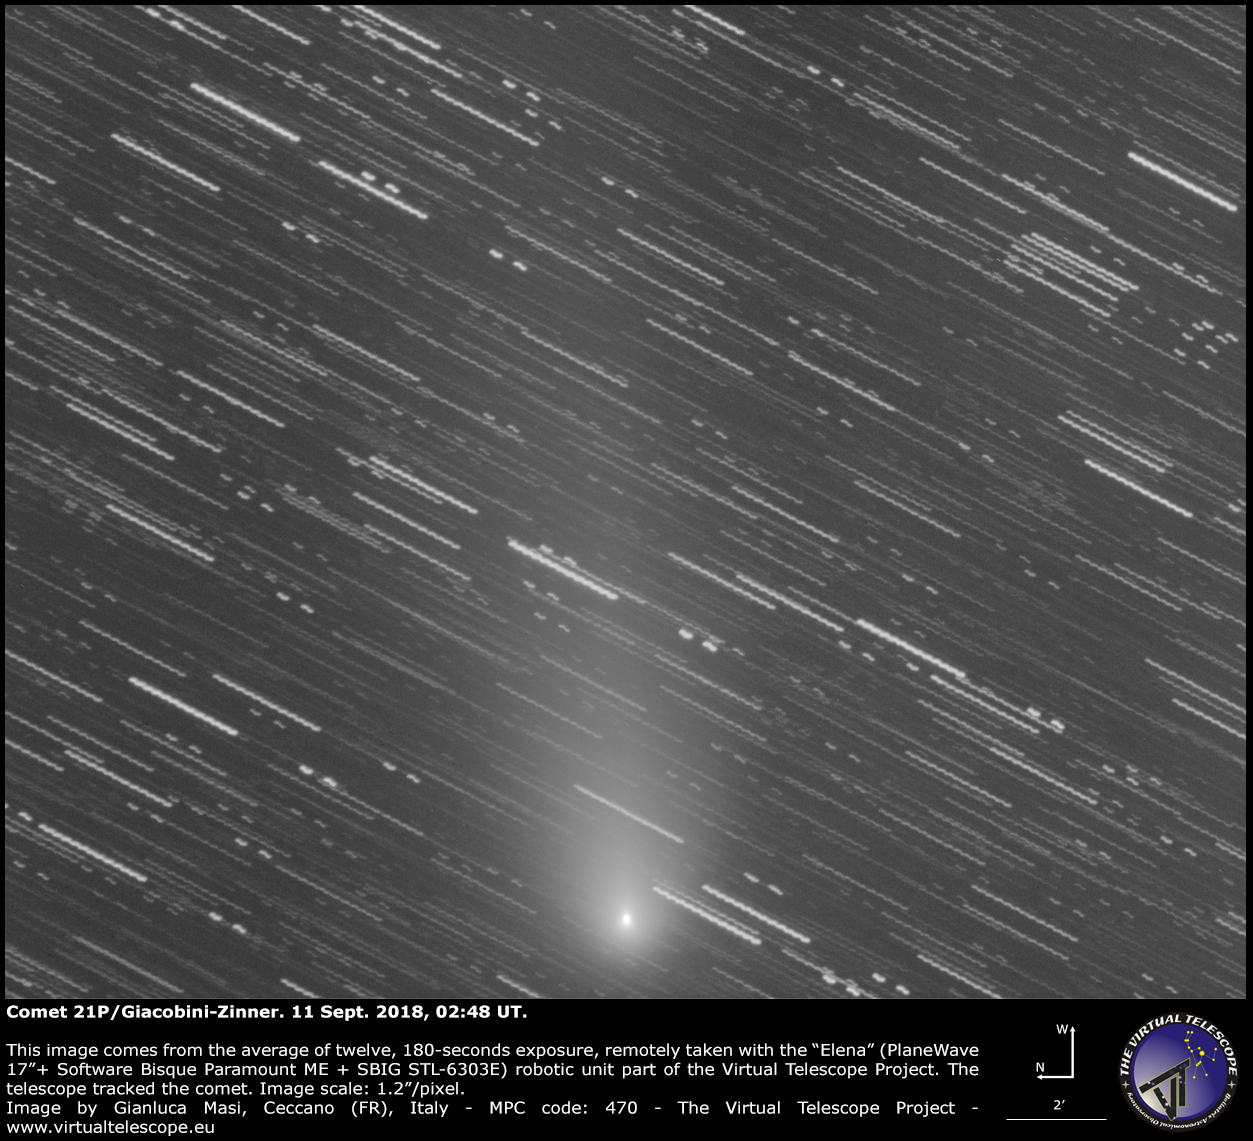 Comet 21P/Giacobini-Zinner: 11 Sept. 2018